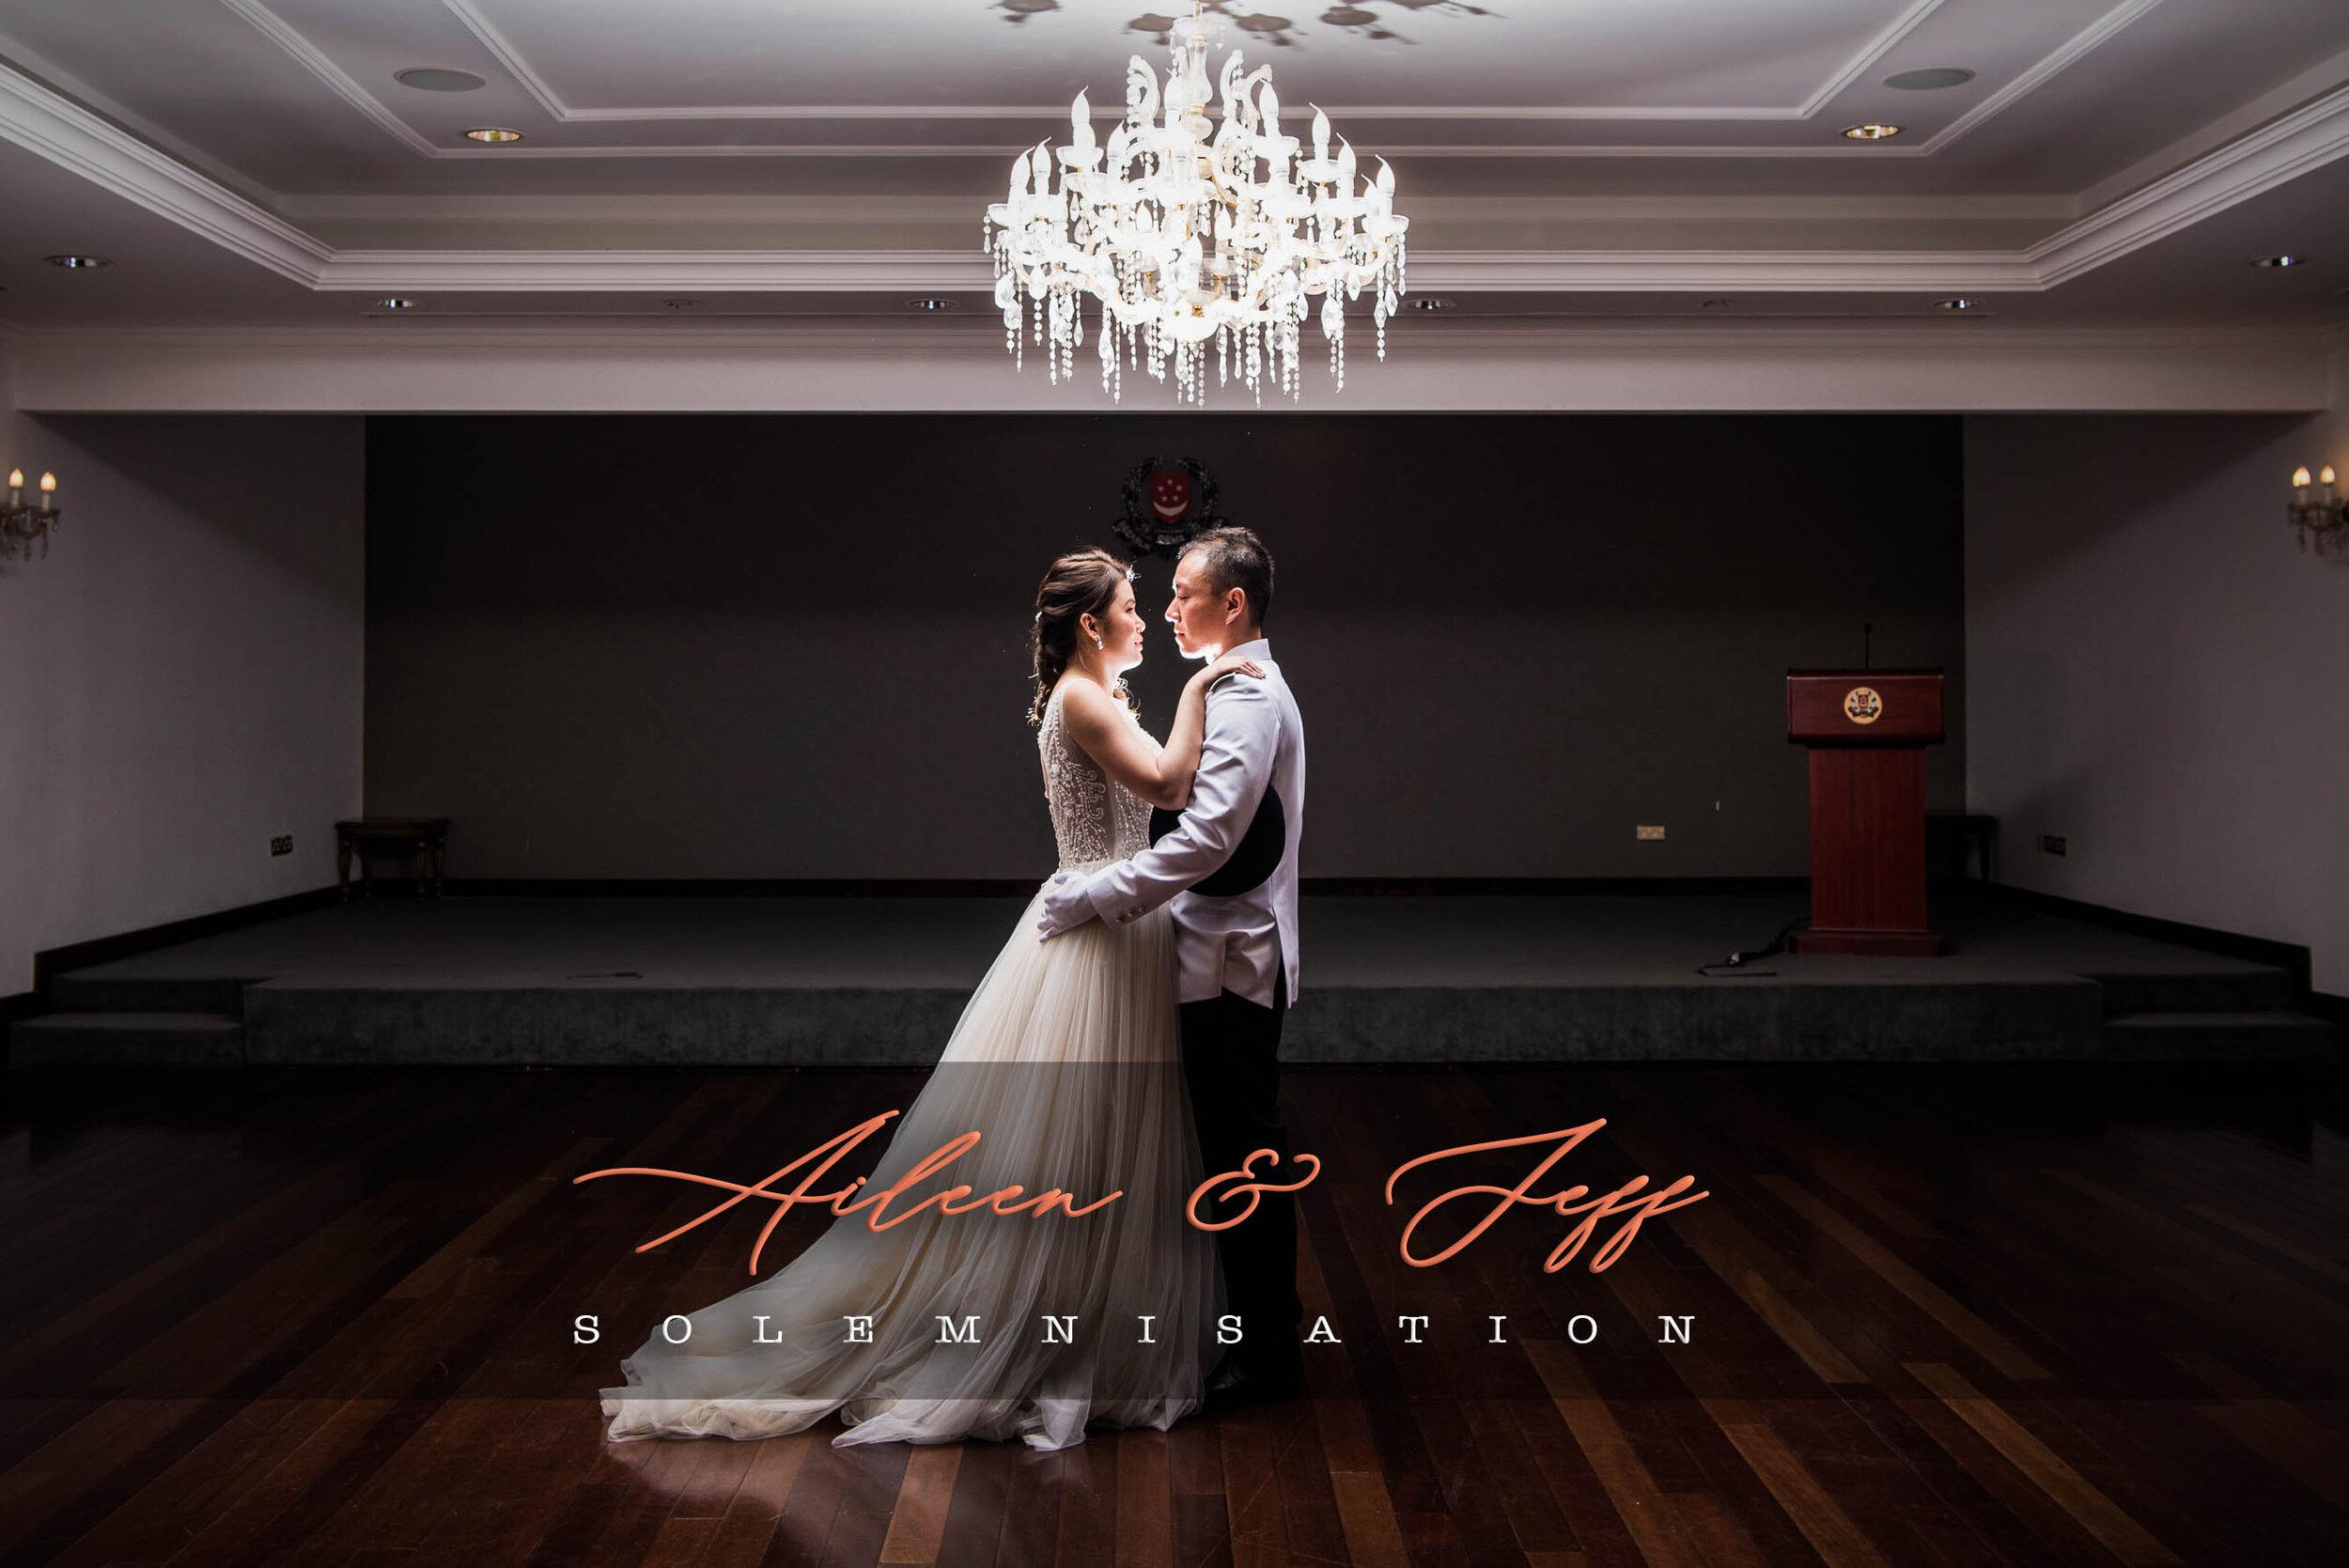 Singapore Solemnisation Photography Wedding Best